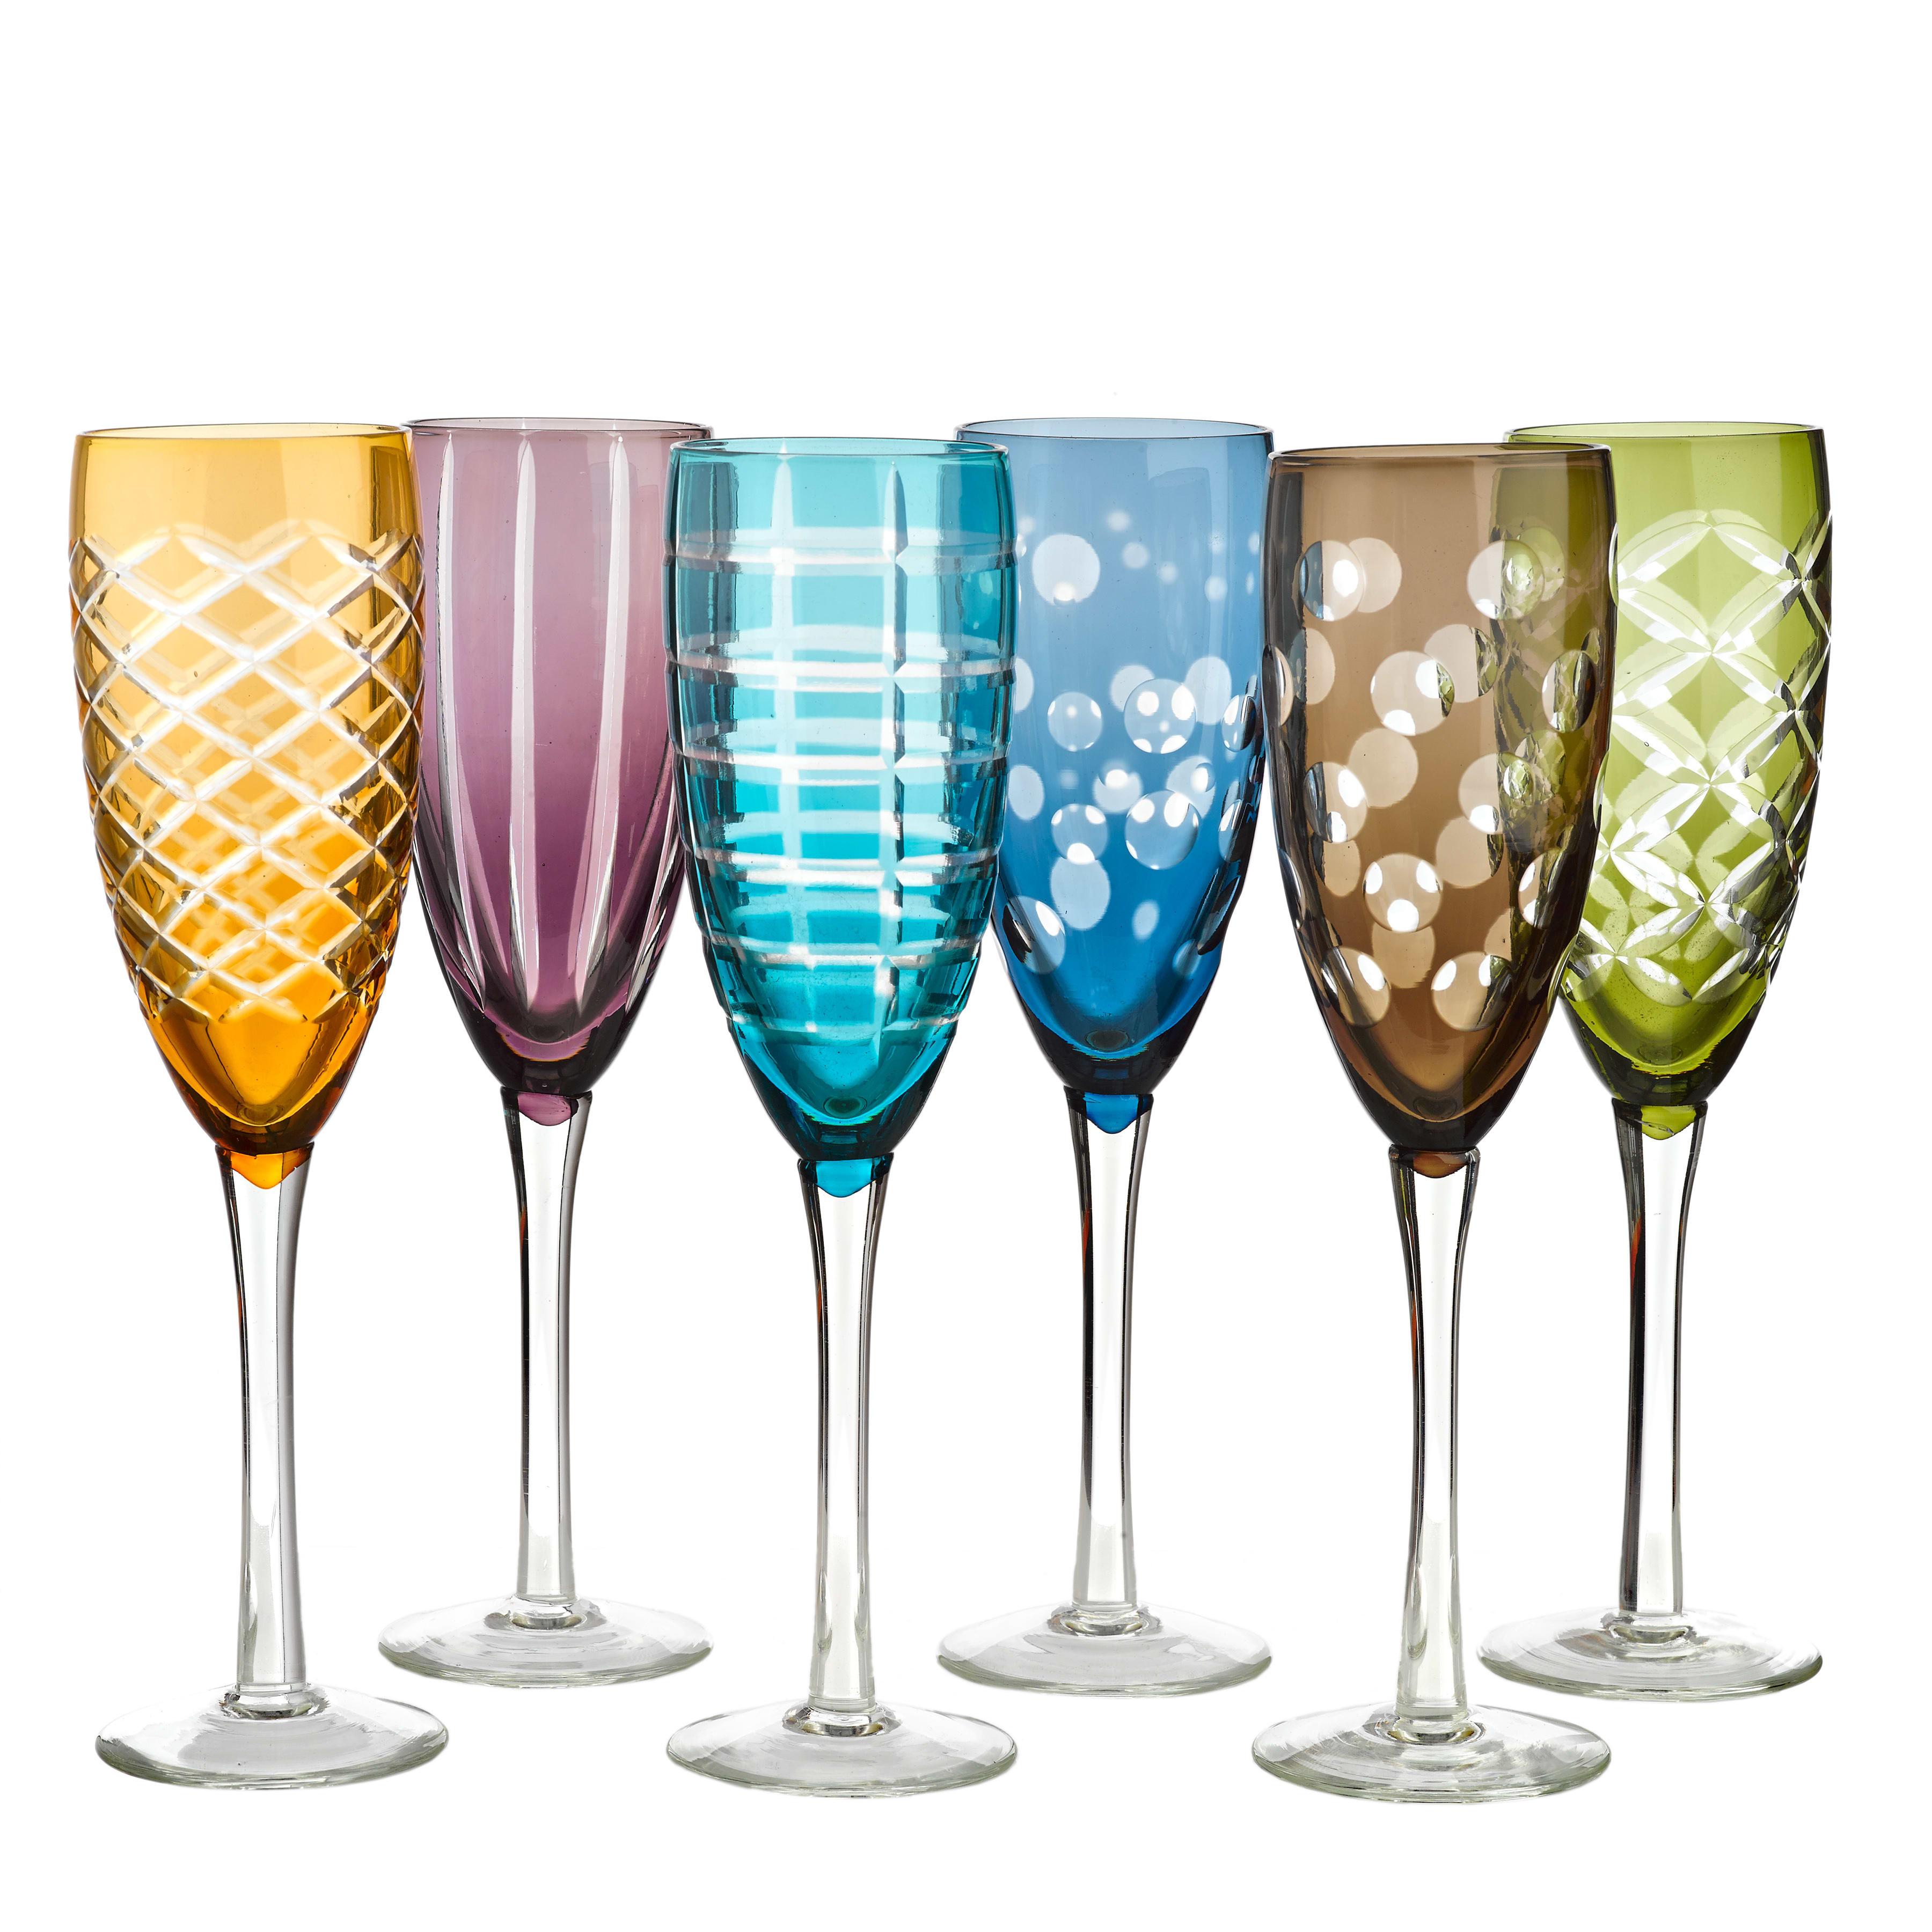 Pols Potten Set of Six Multicoloured Cut Glass Champagne Flutes